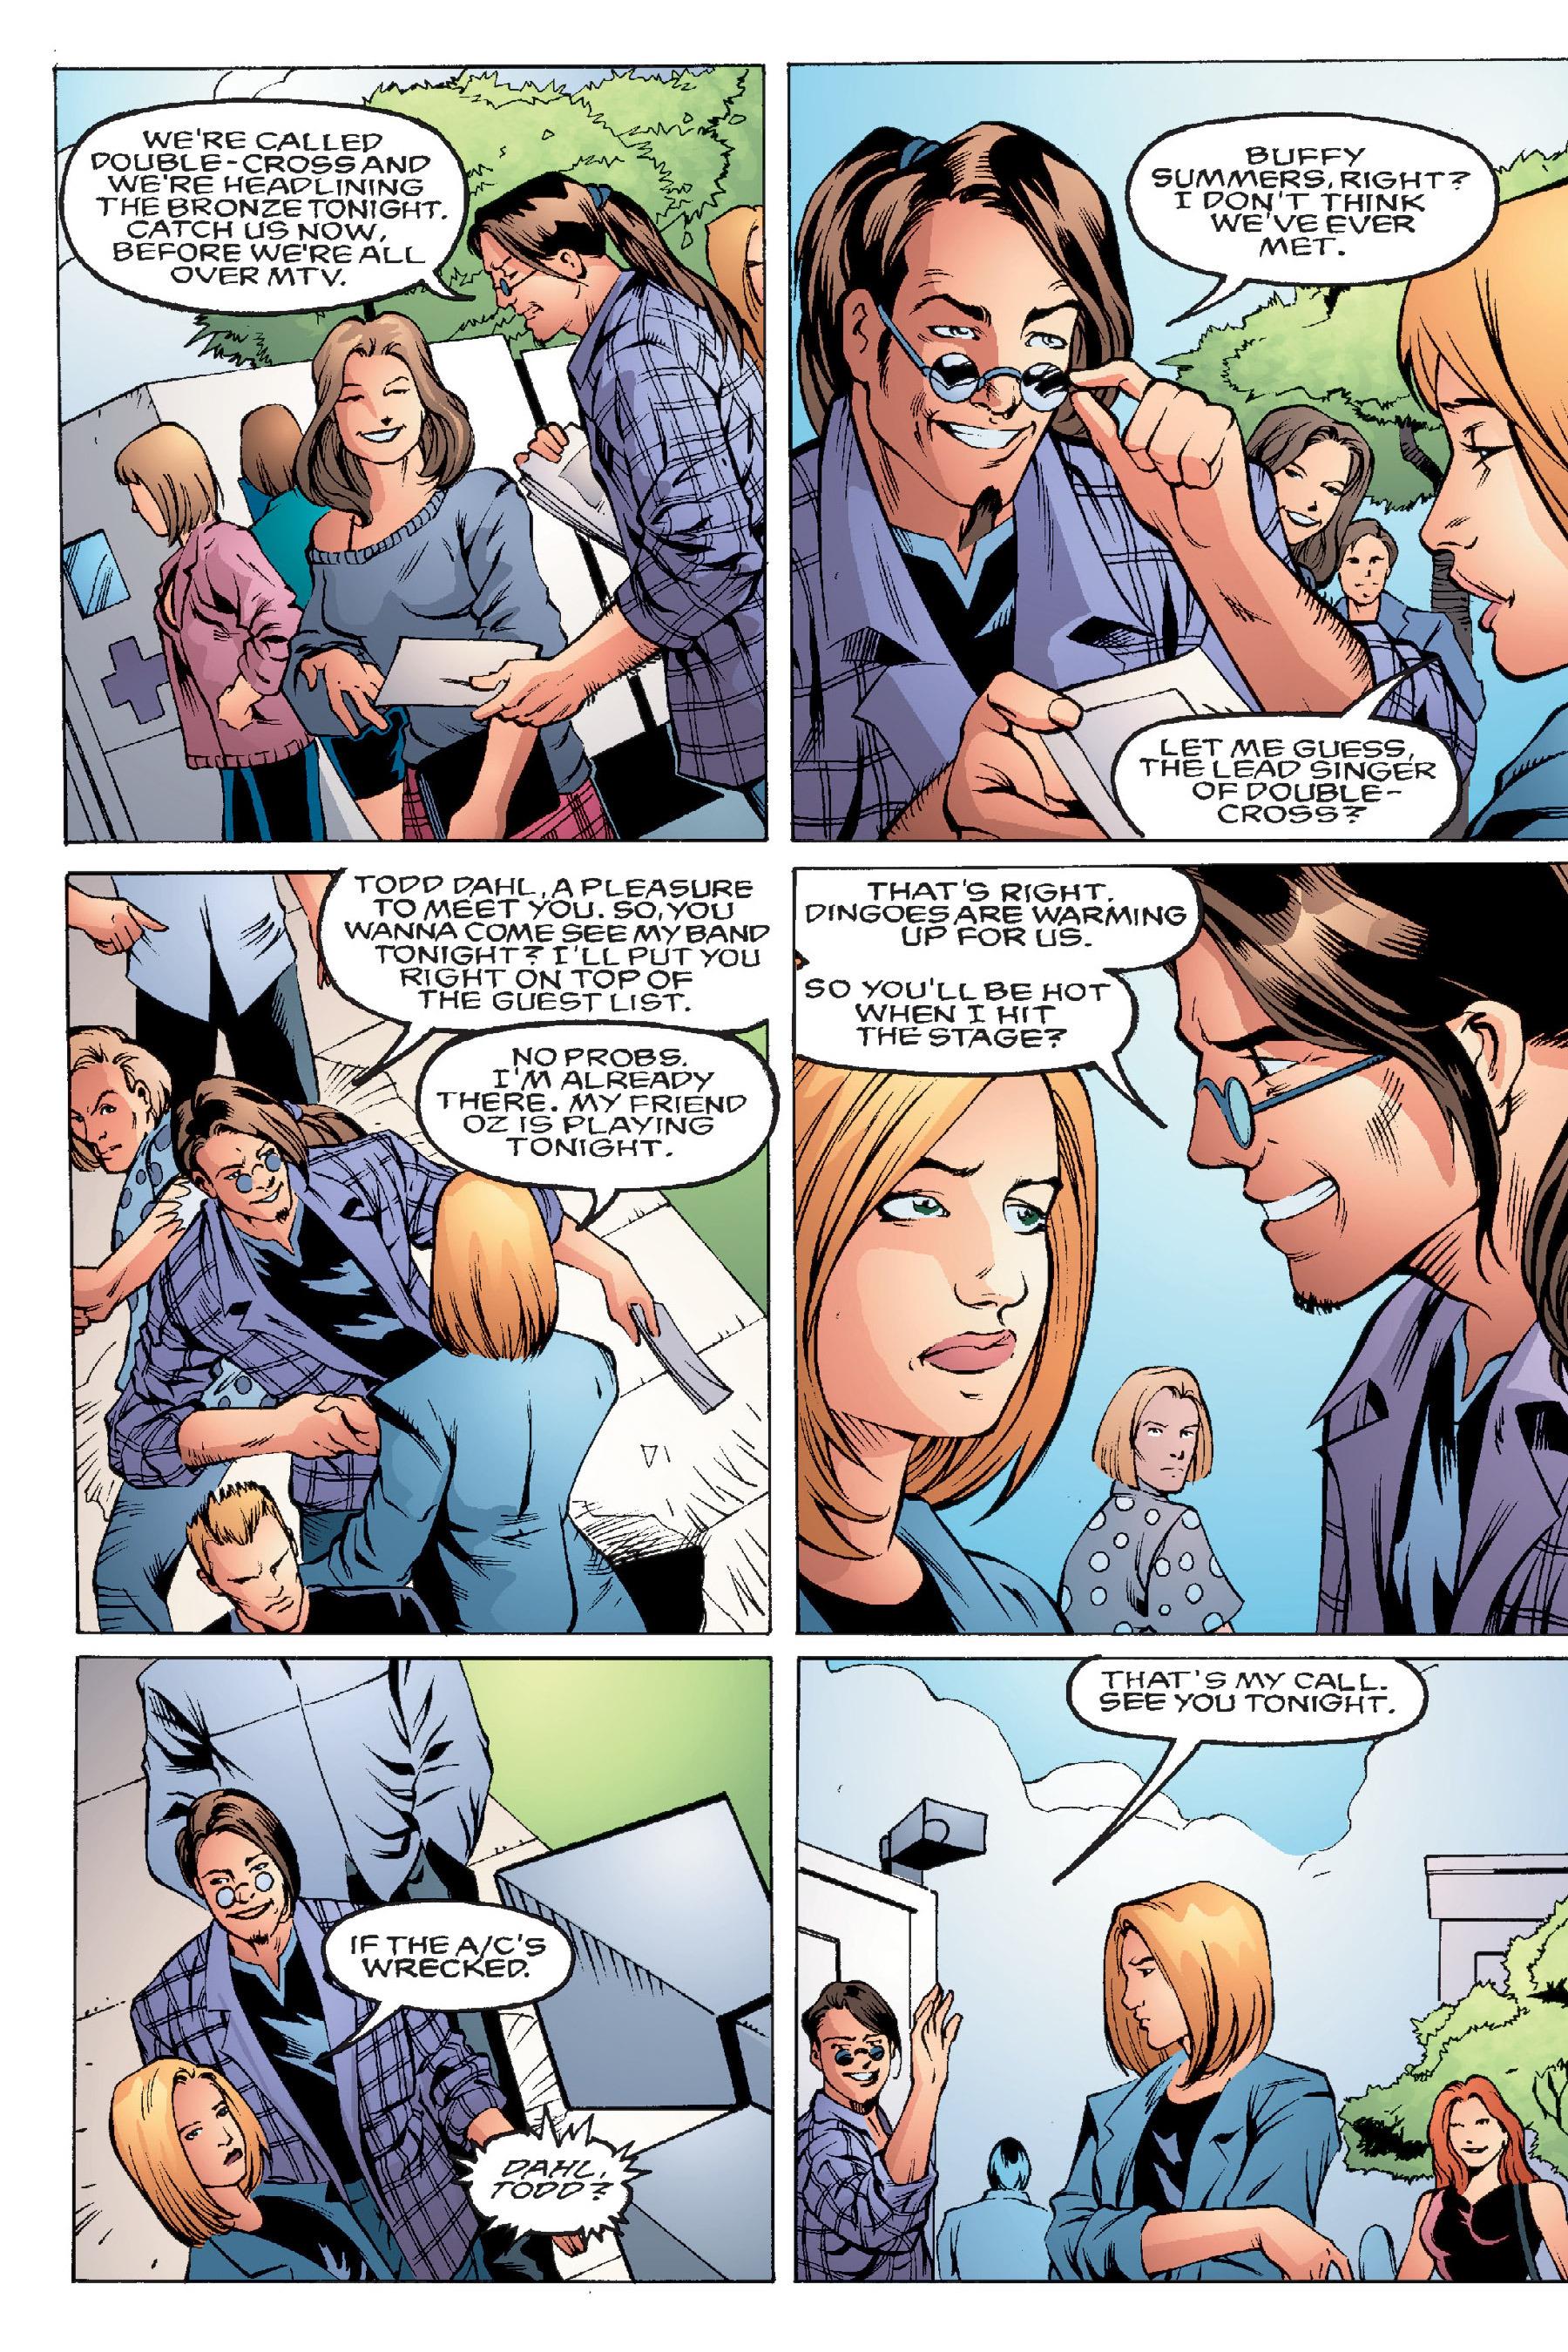 Read online Buffy the Vampire Slayer: Omnibus comic -  Issue # TPB 4 - 58